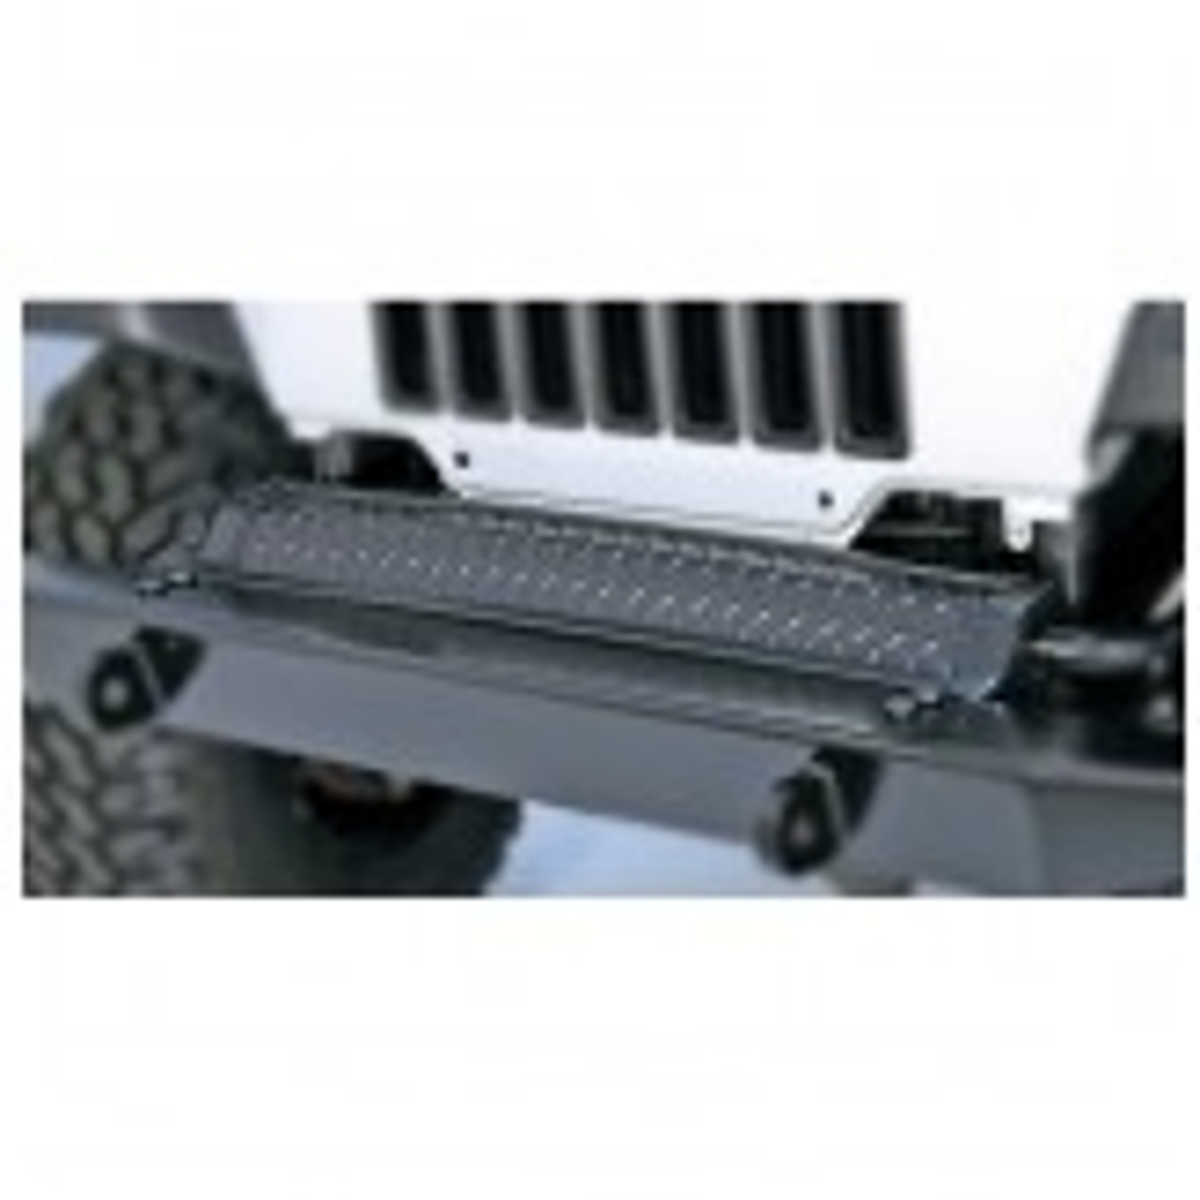 Front Frame Cover Body Armor 97-06 Jeep Wrangler